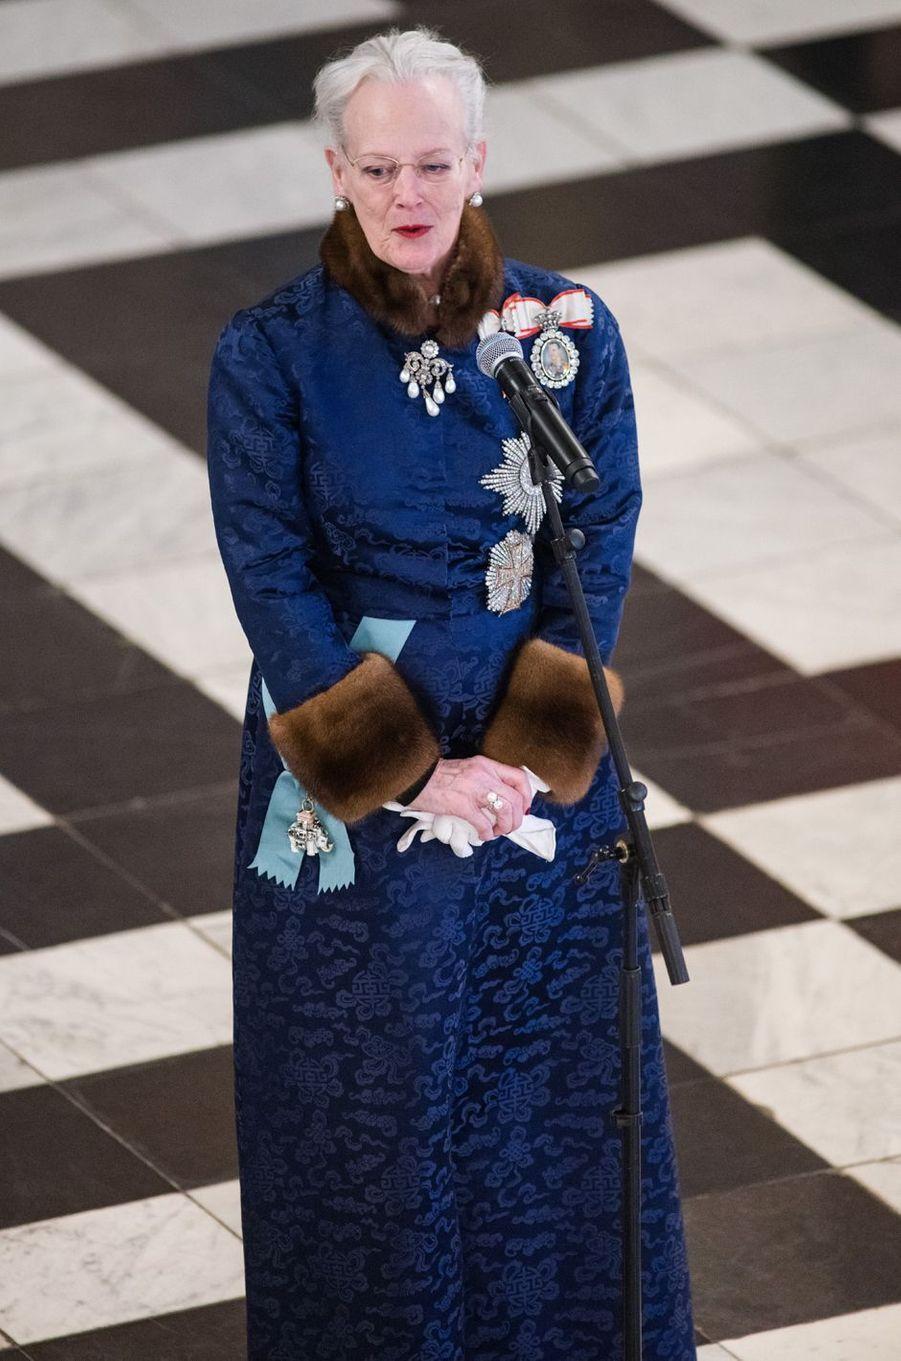 Mary Frederik Margrethe Danemark Copenhague 3 Janv 2017 9